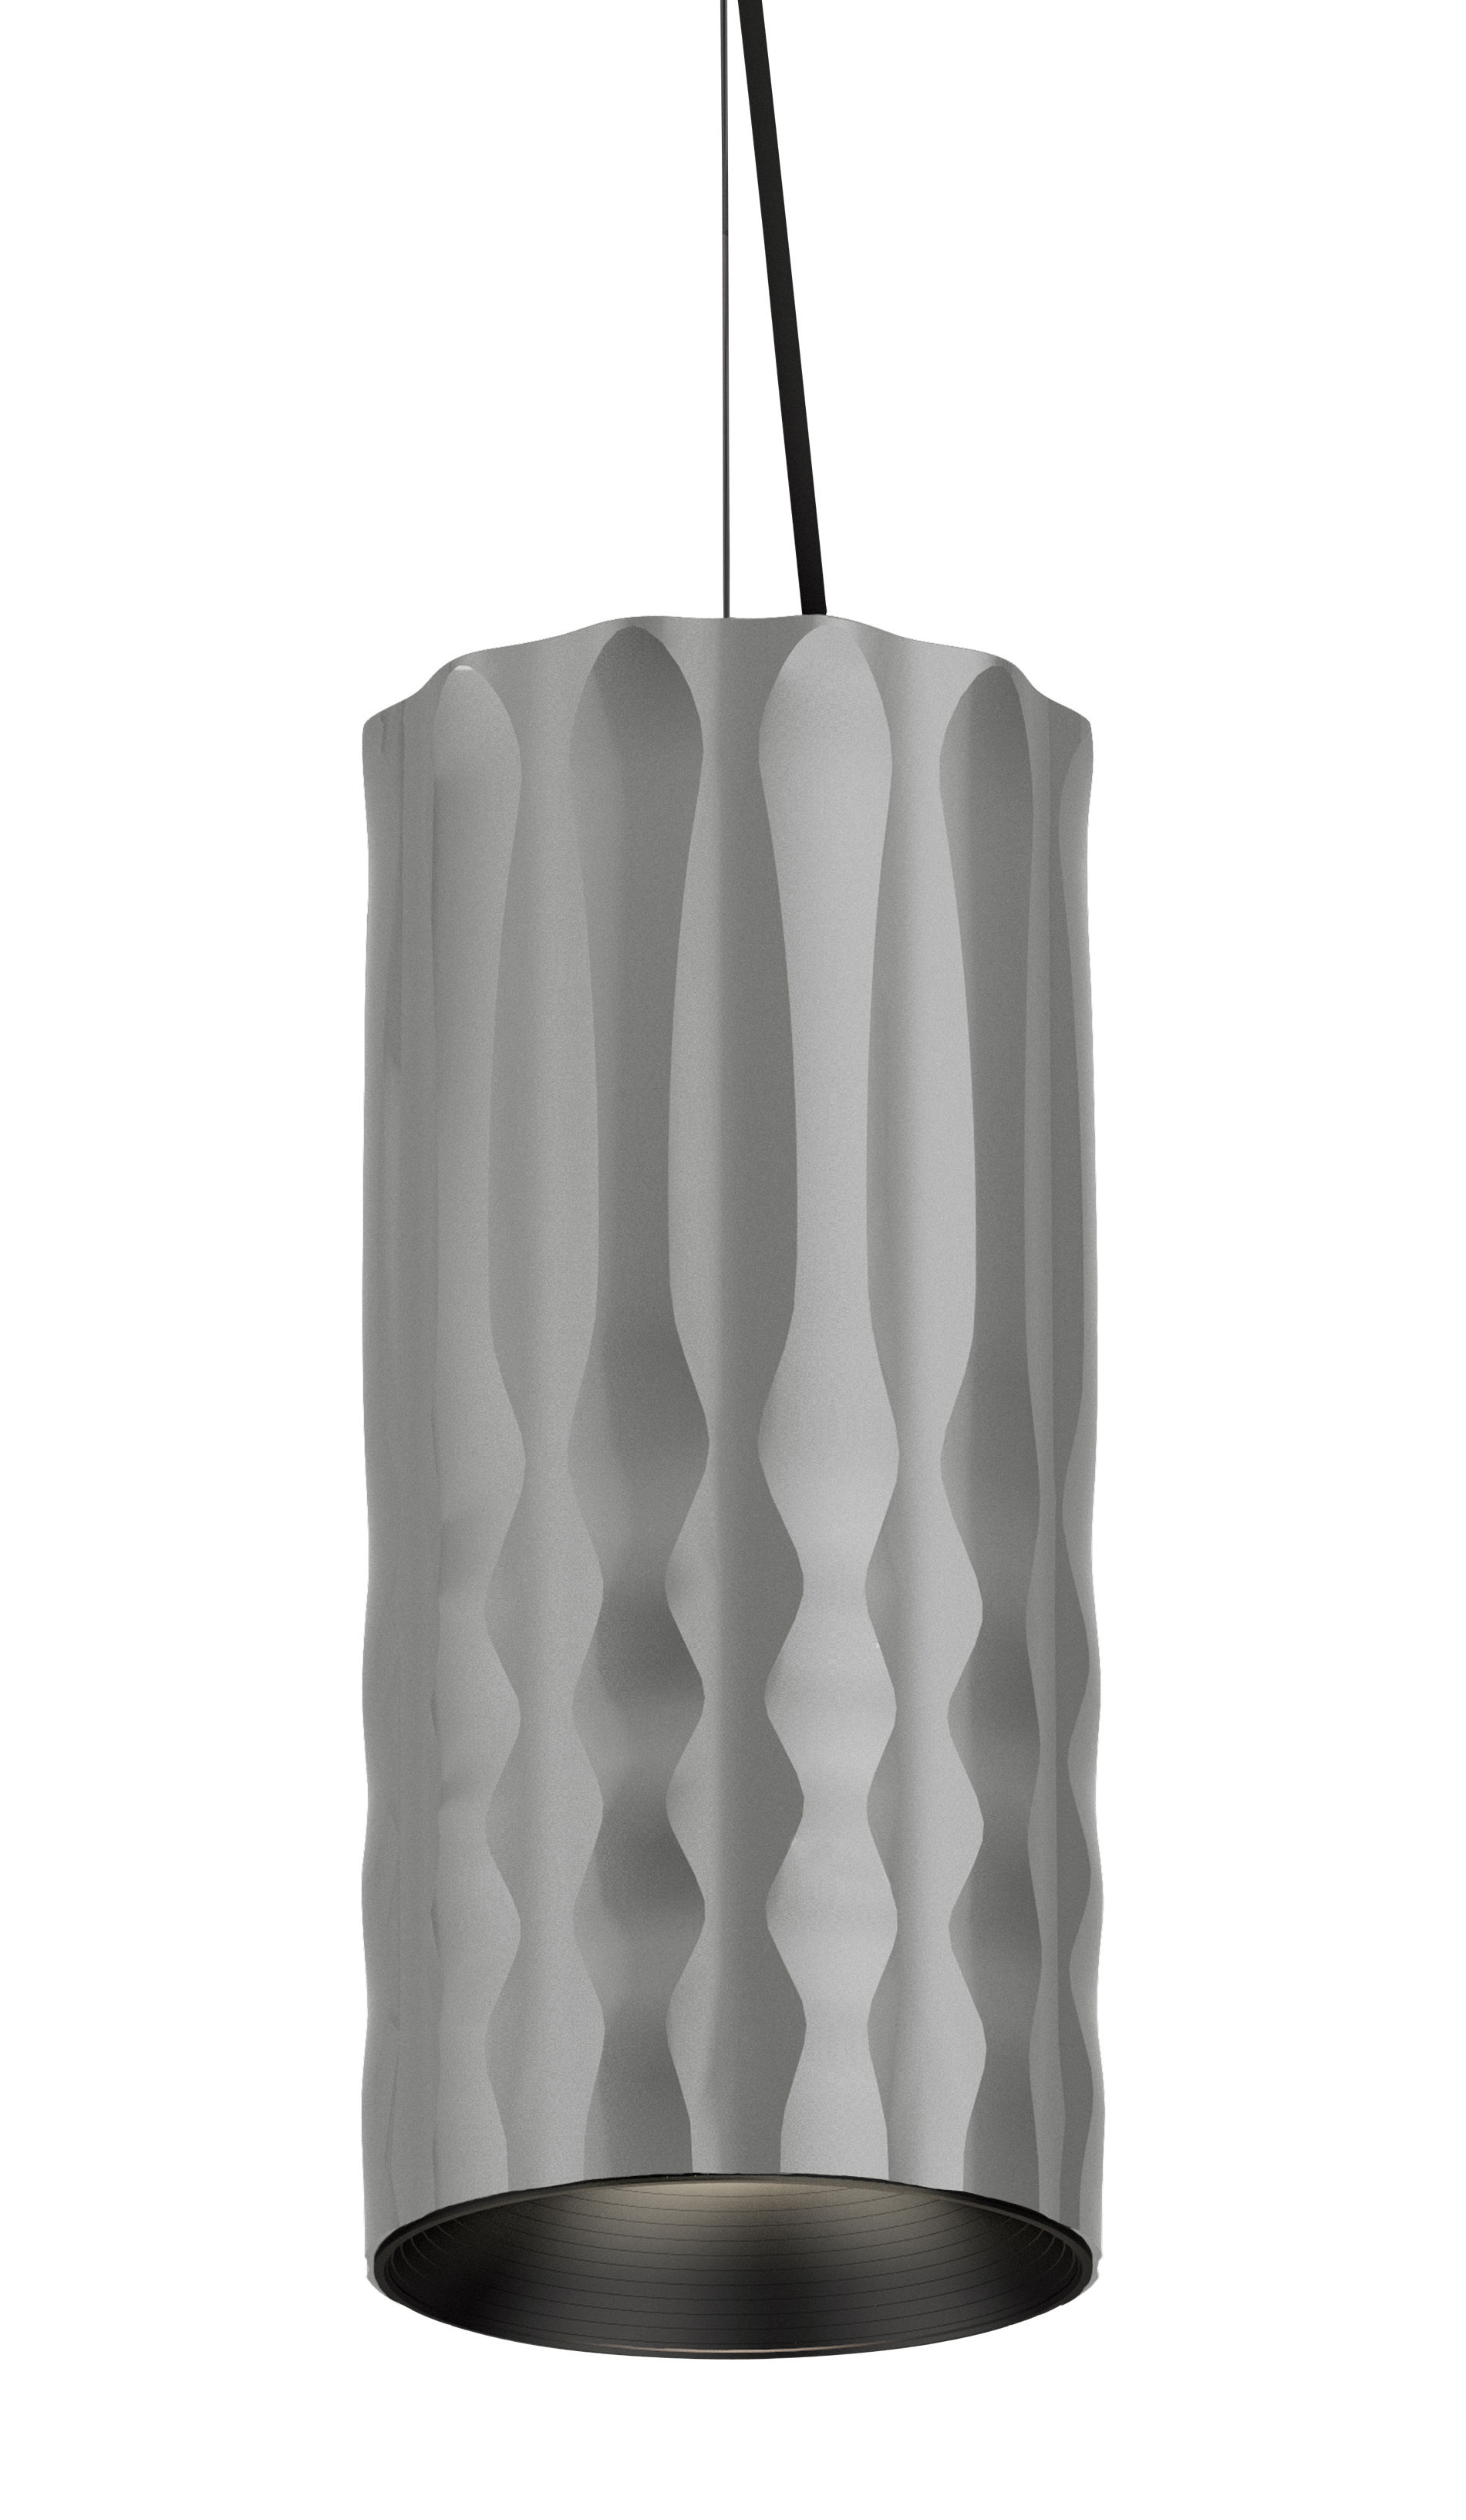 Luminaire - Suspensions - Suspension Fiamma / Ø 13 cm - Artemide - Gris - Métal